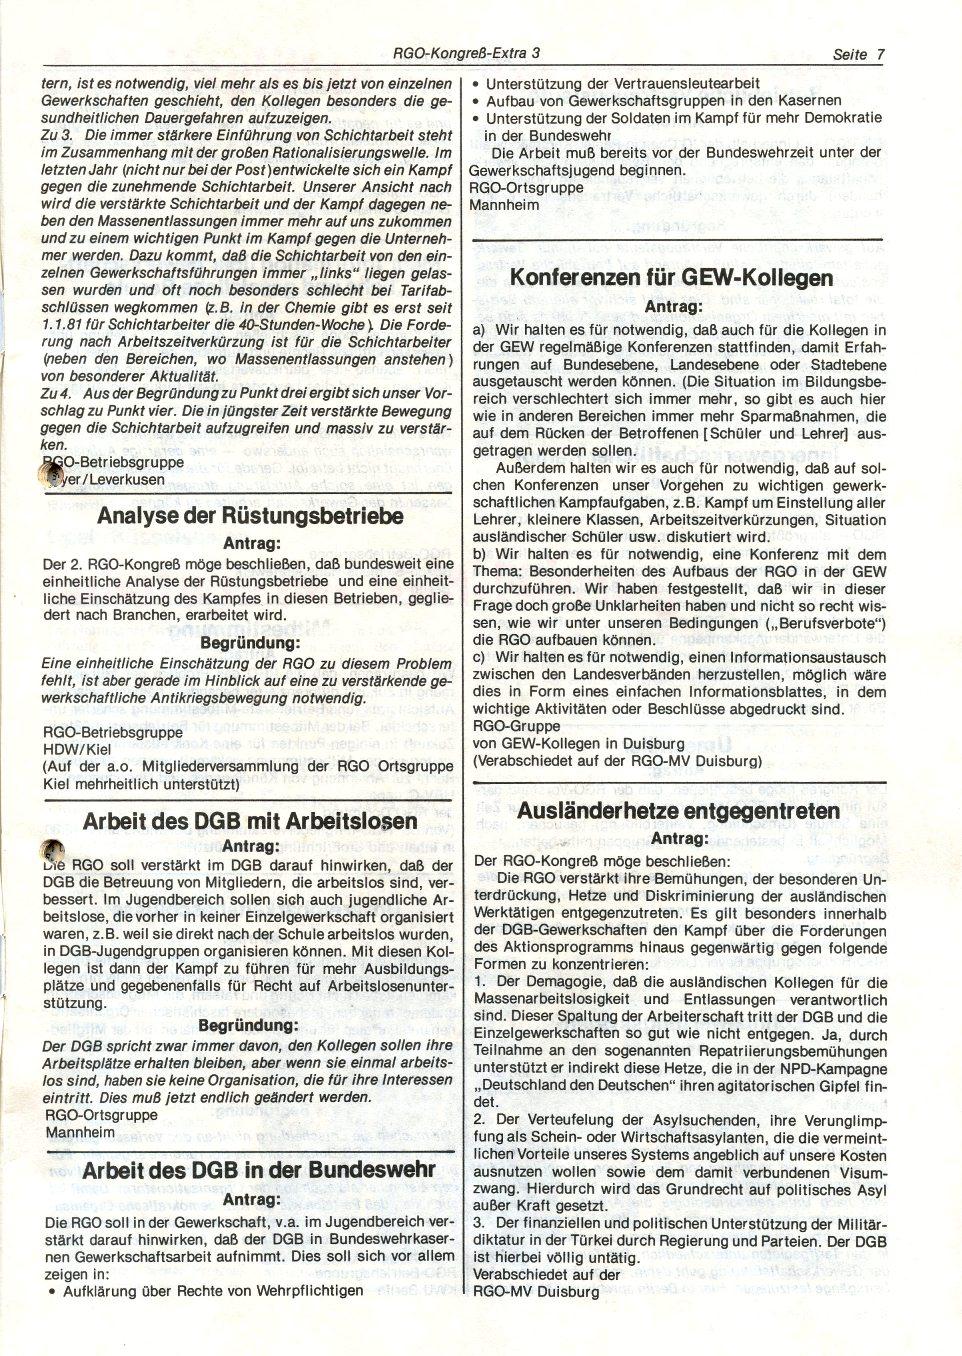 RGO_Kongress_Extra_1981_3_07